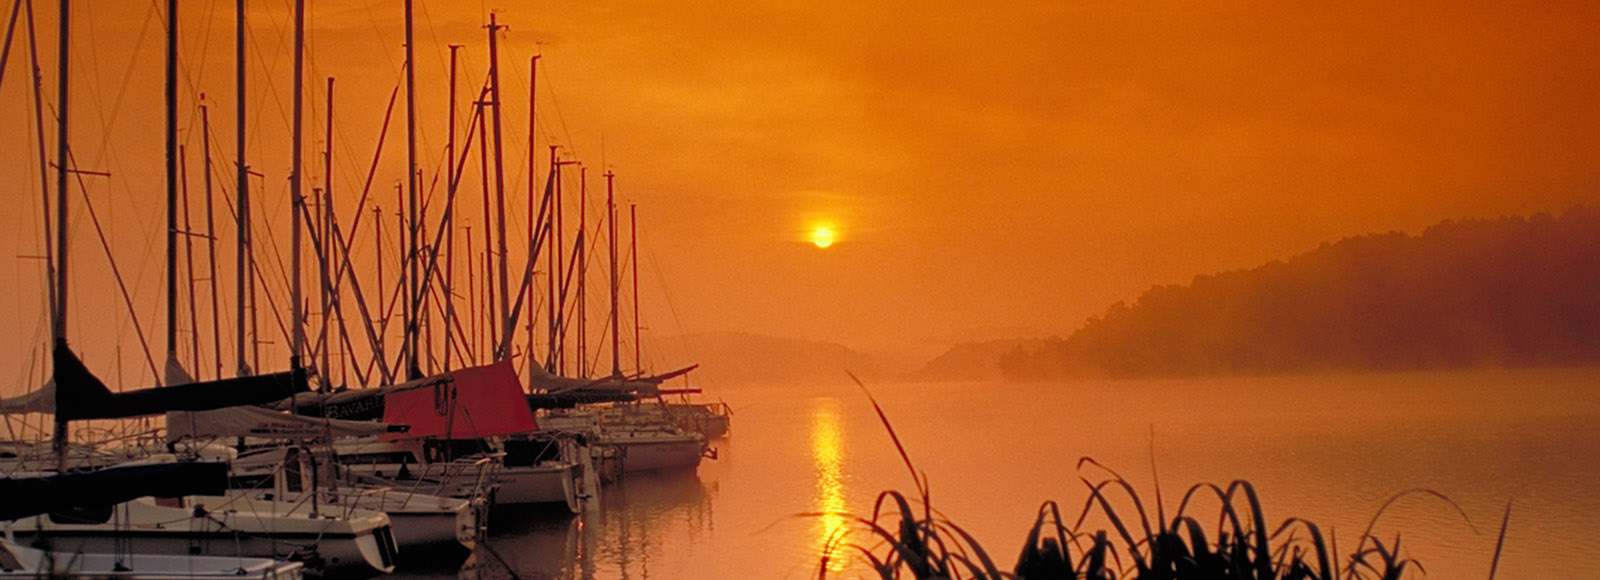 Bostalsee Segelhafen